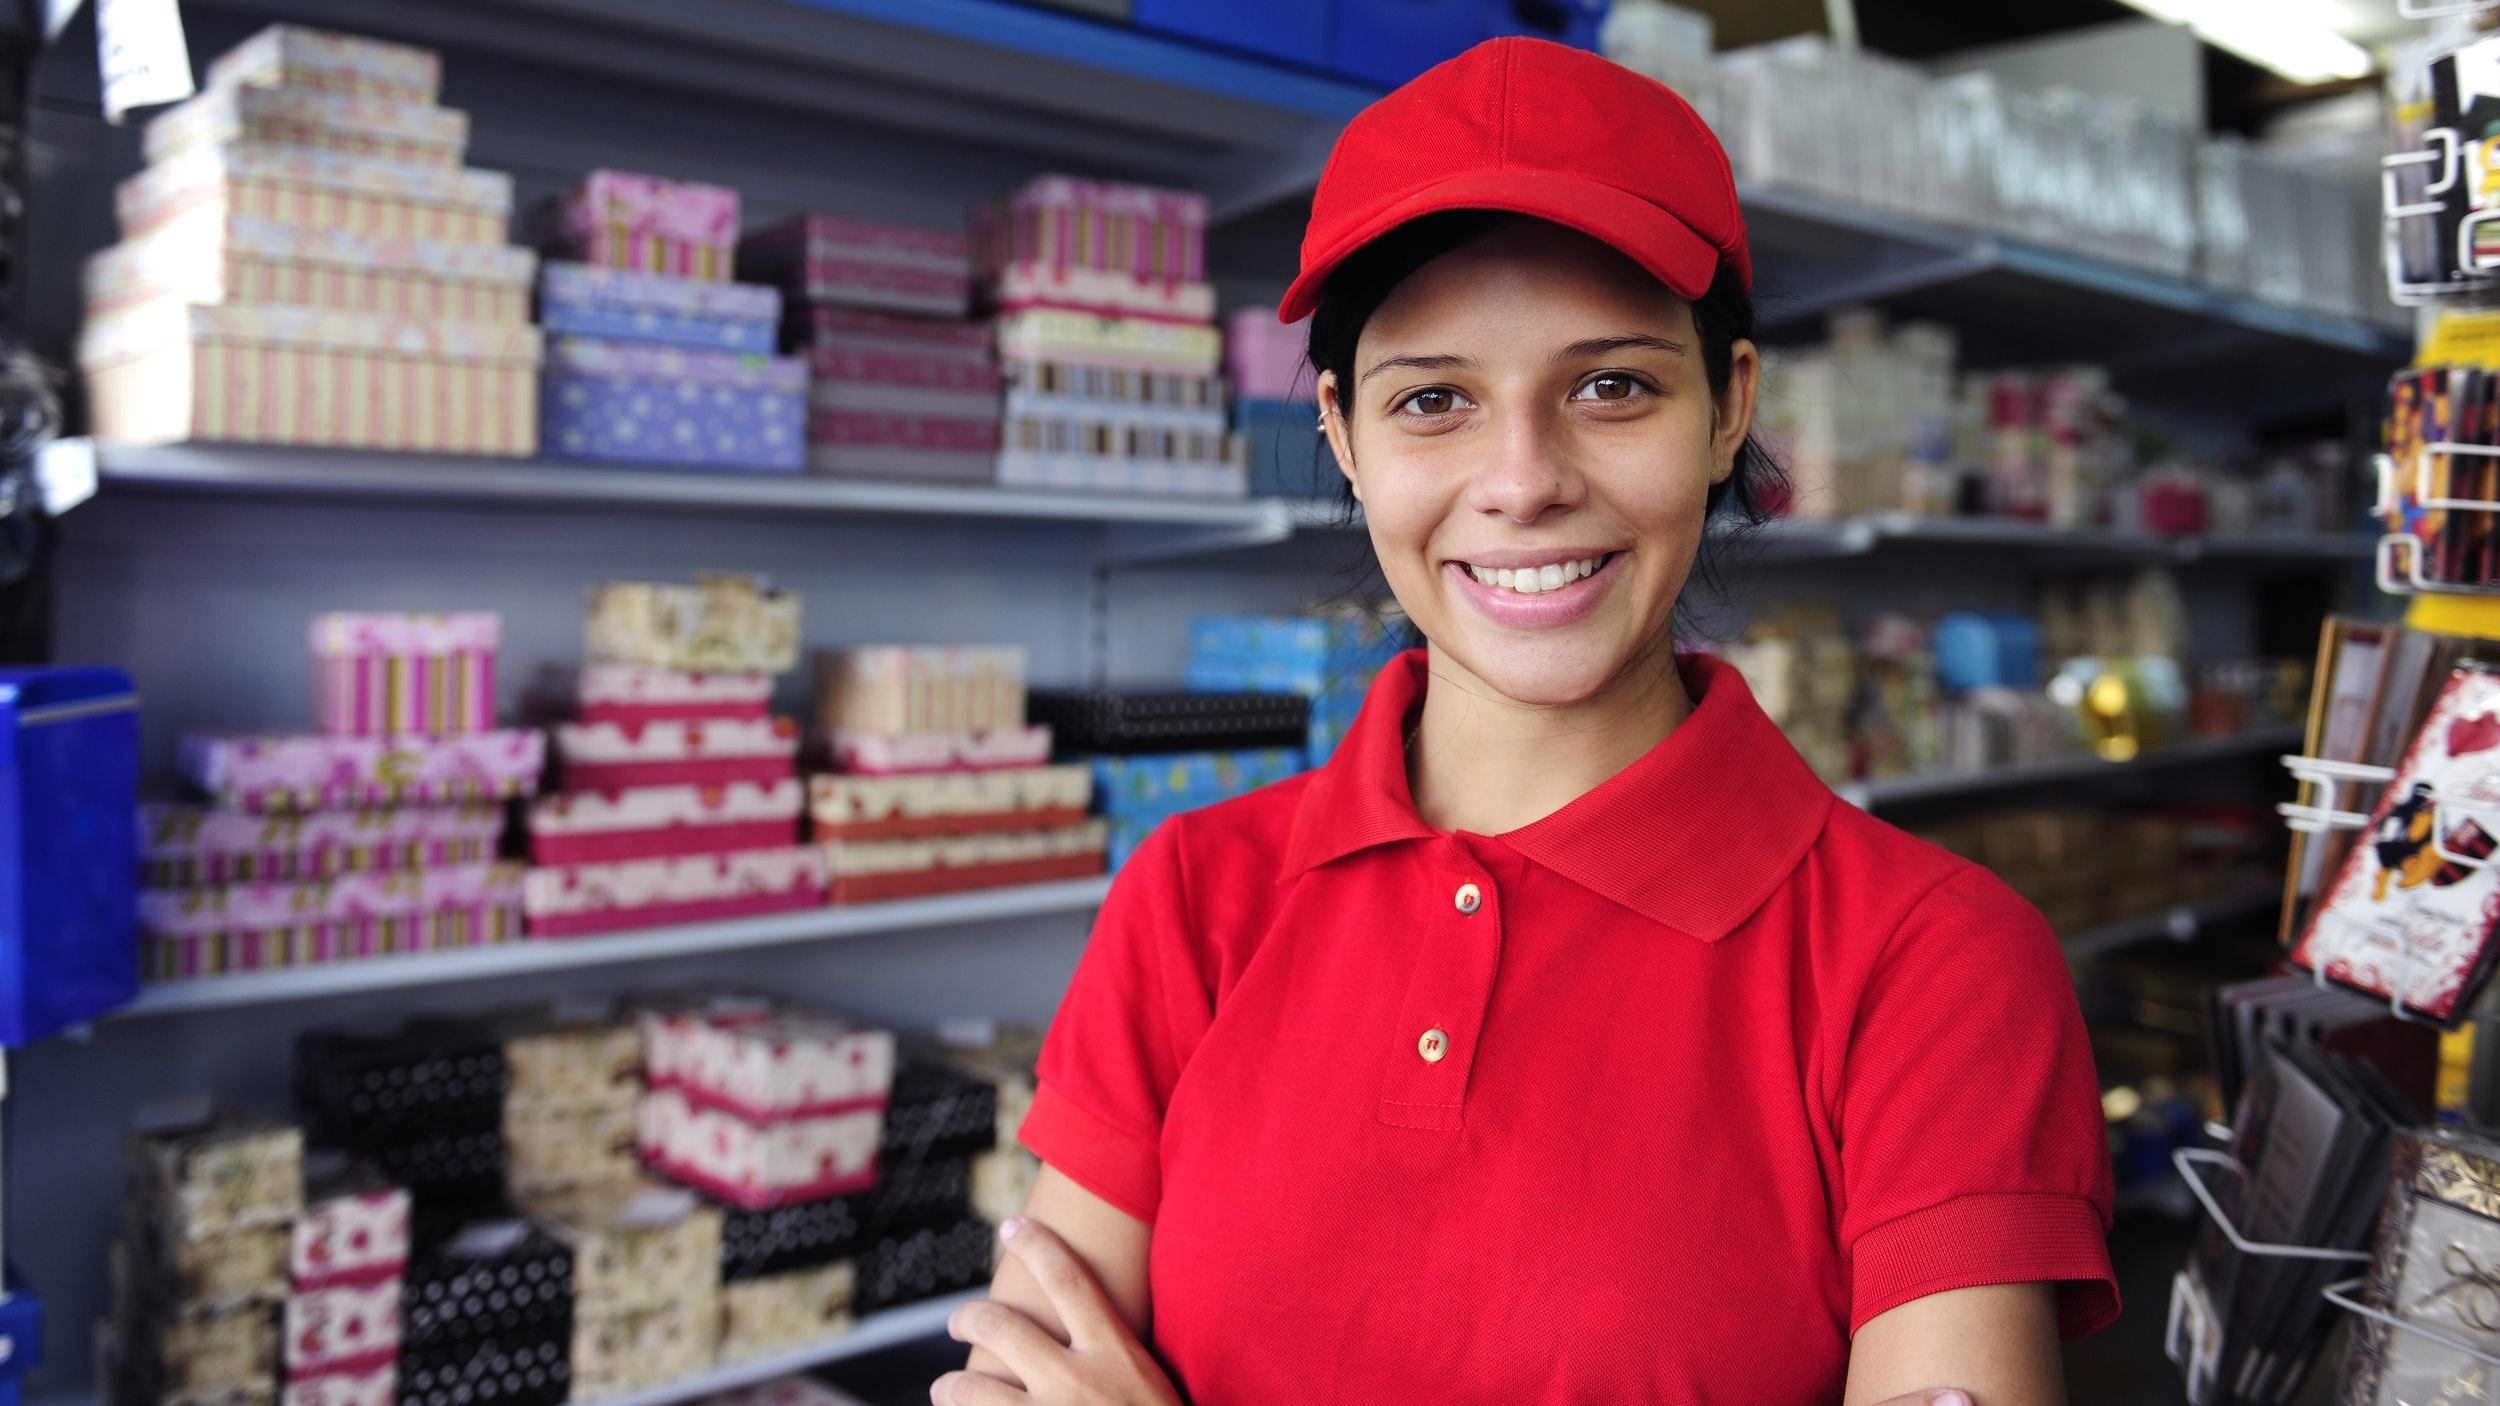 Woman wearing work uniform working in gift shop smiles